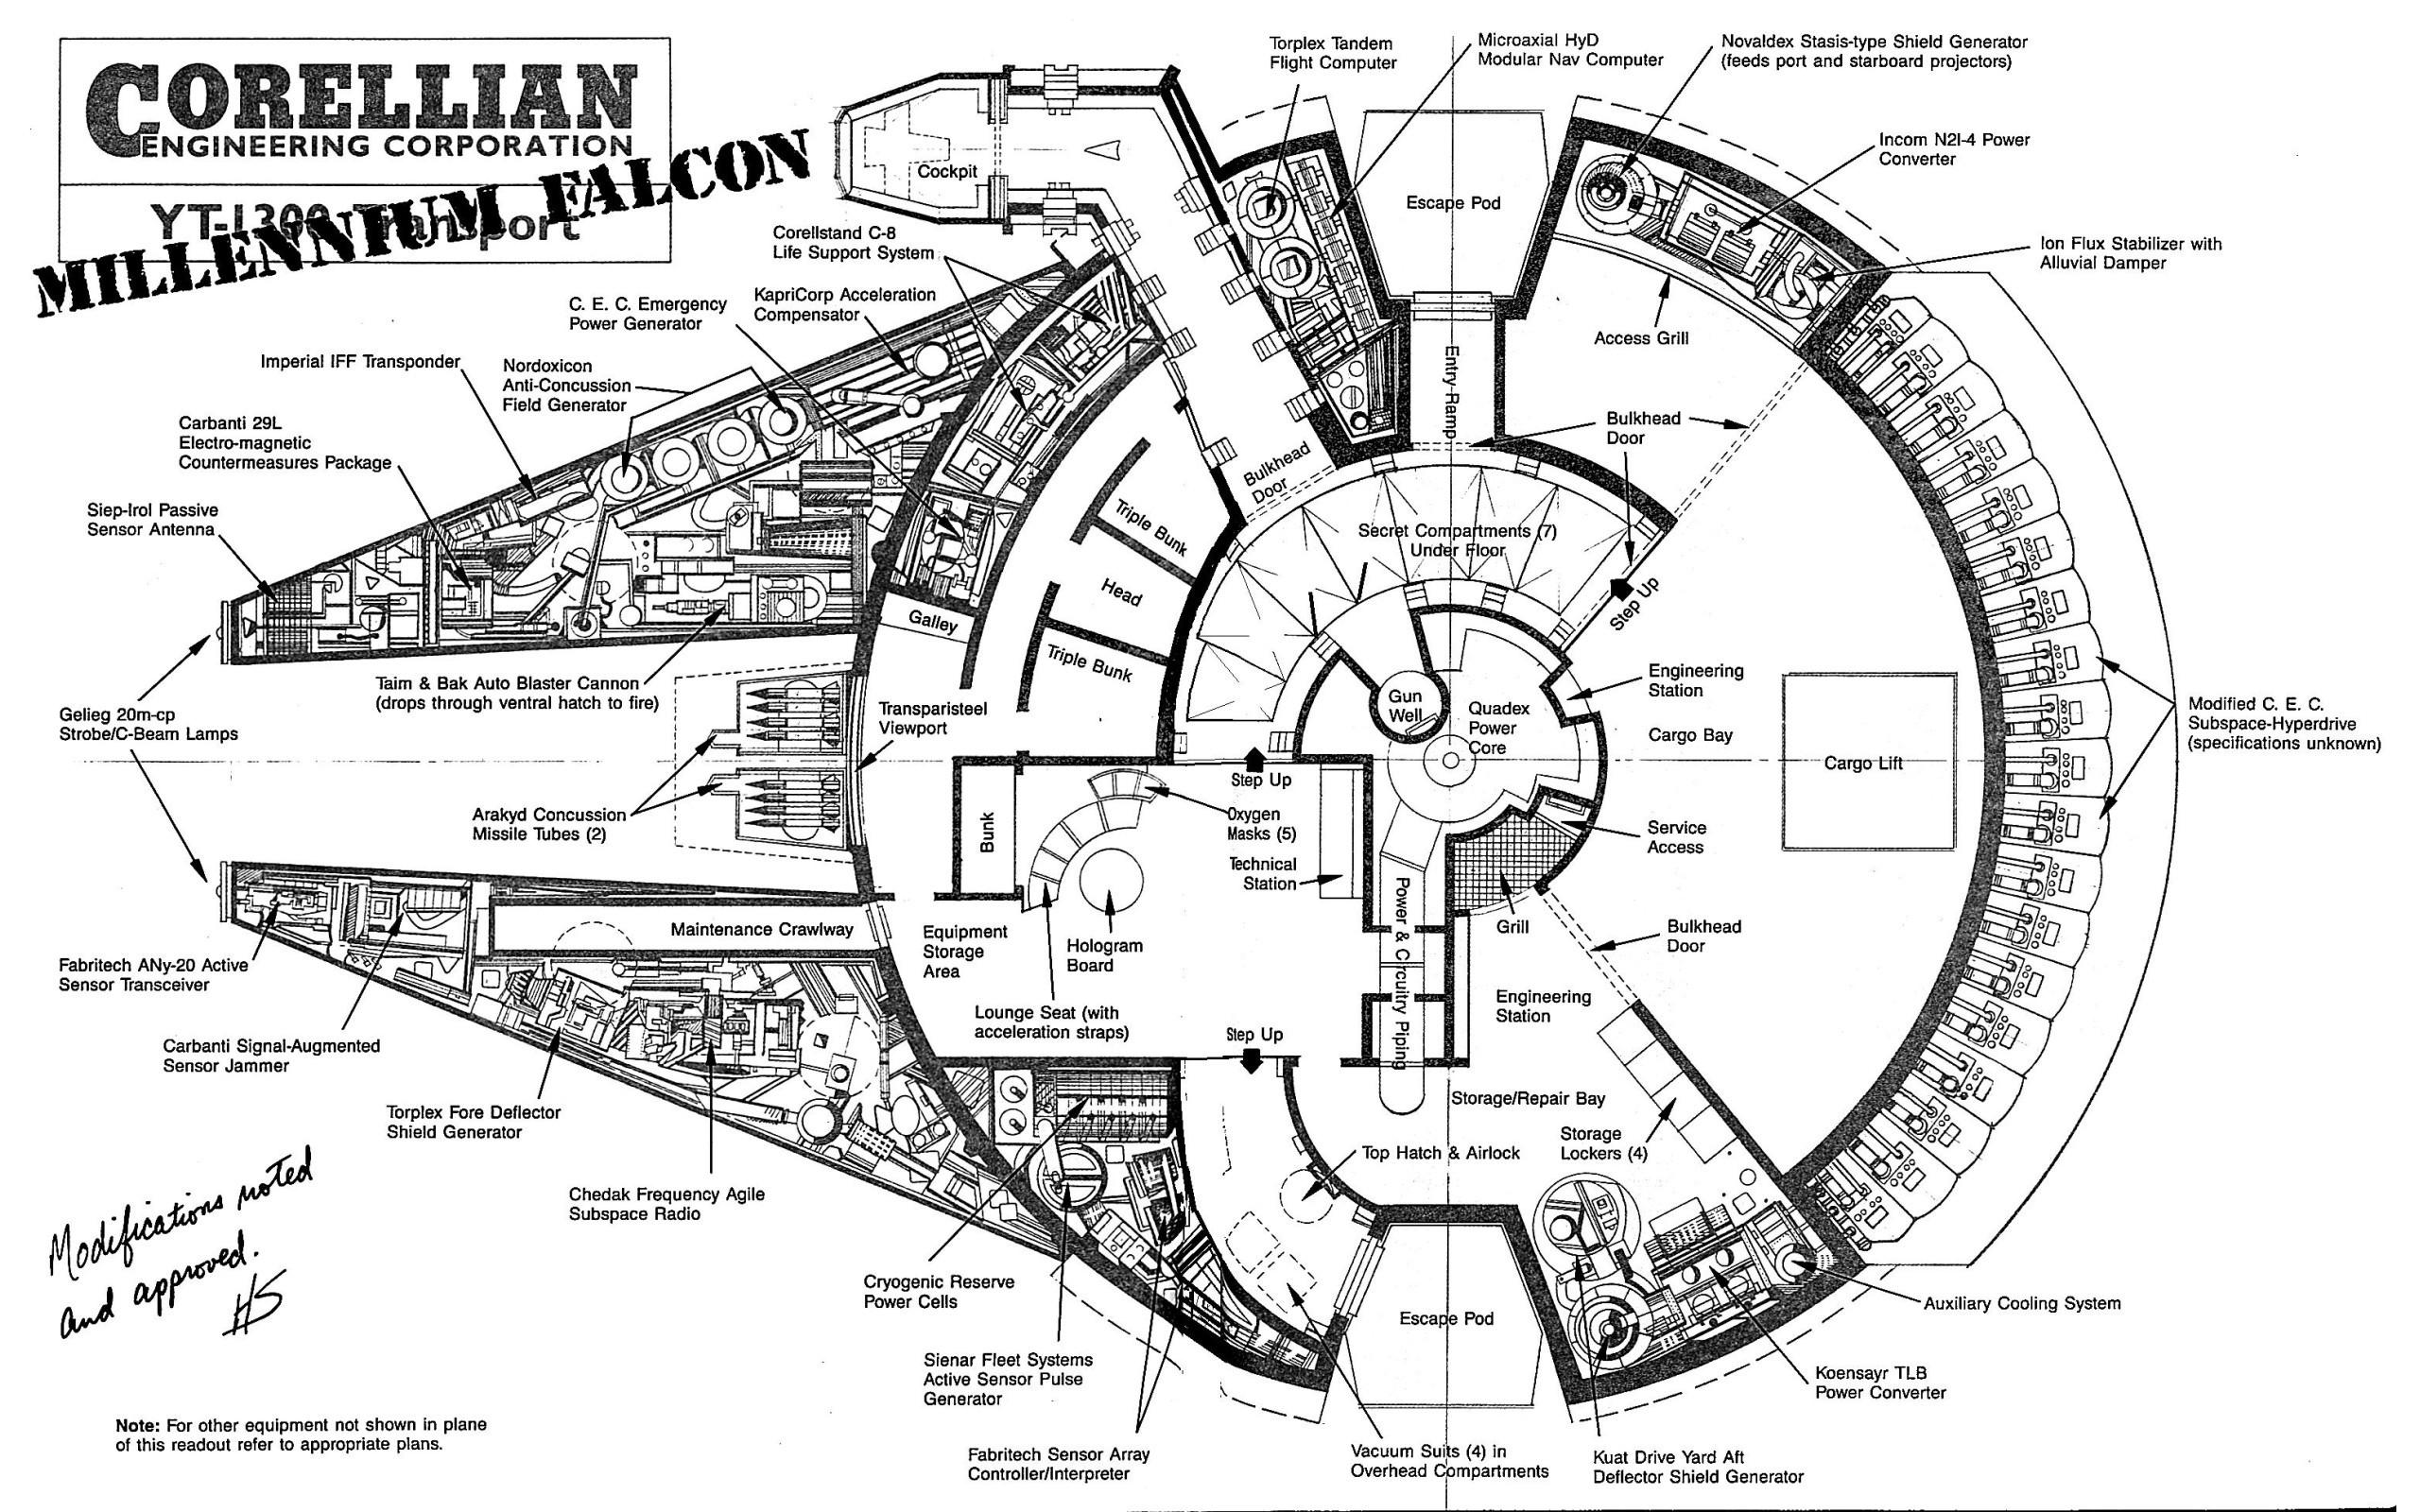 Wallpaper Star Wars Monochrome Line Art Millennium Falcon Blueprints Sketch Diagram Technical Drawing 2560x1600 Knightlord 80008 Hd Wallpapers Wallhere